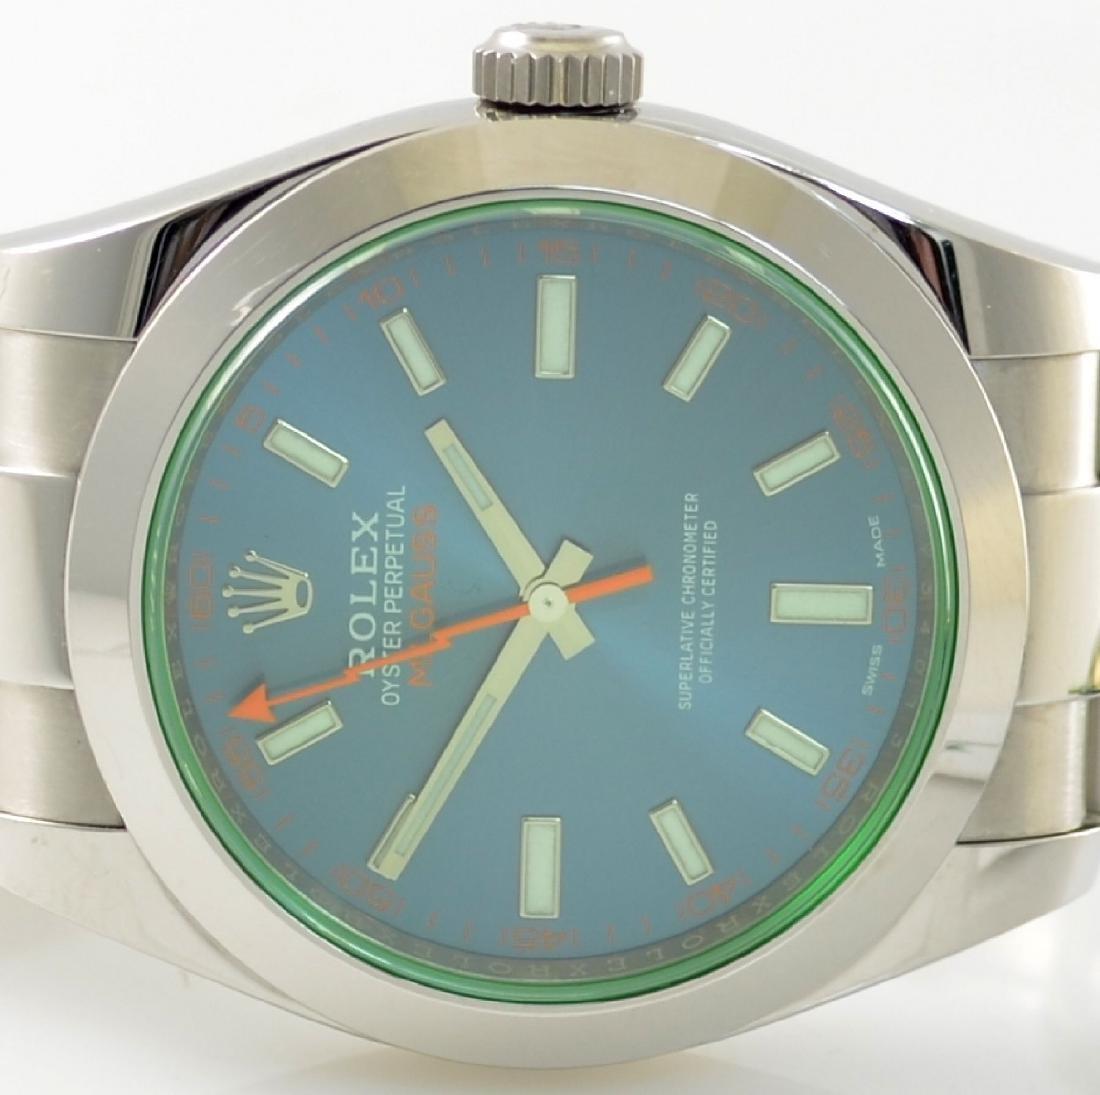 ROLEX wristwatch Oyster Perpetual Milgauss 116400GV - 2